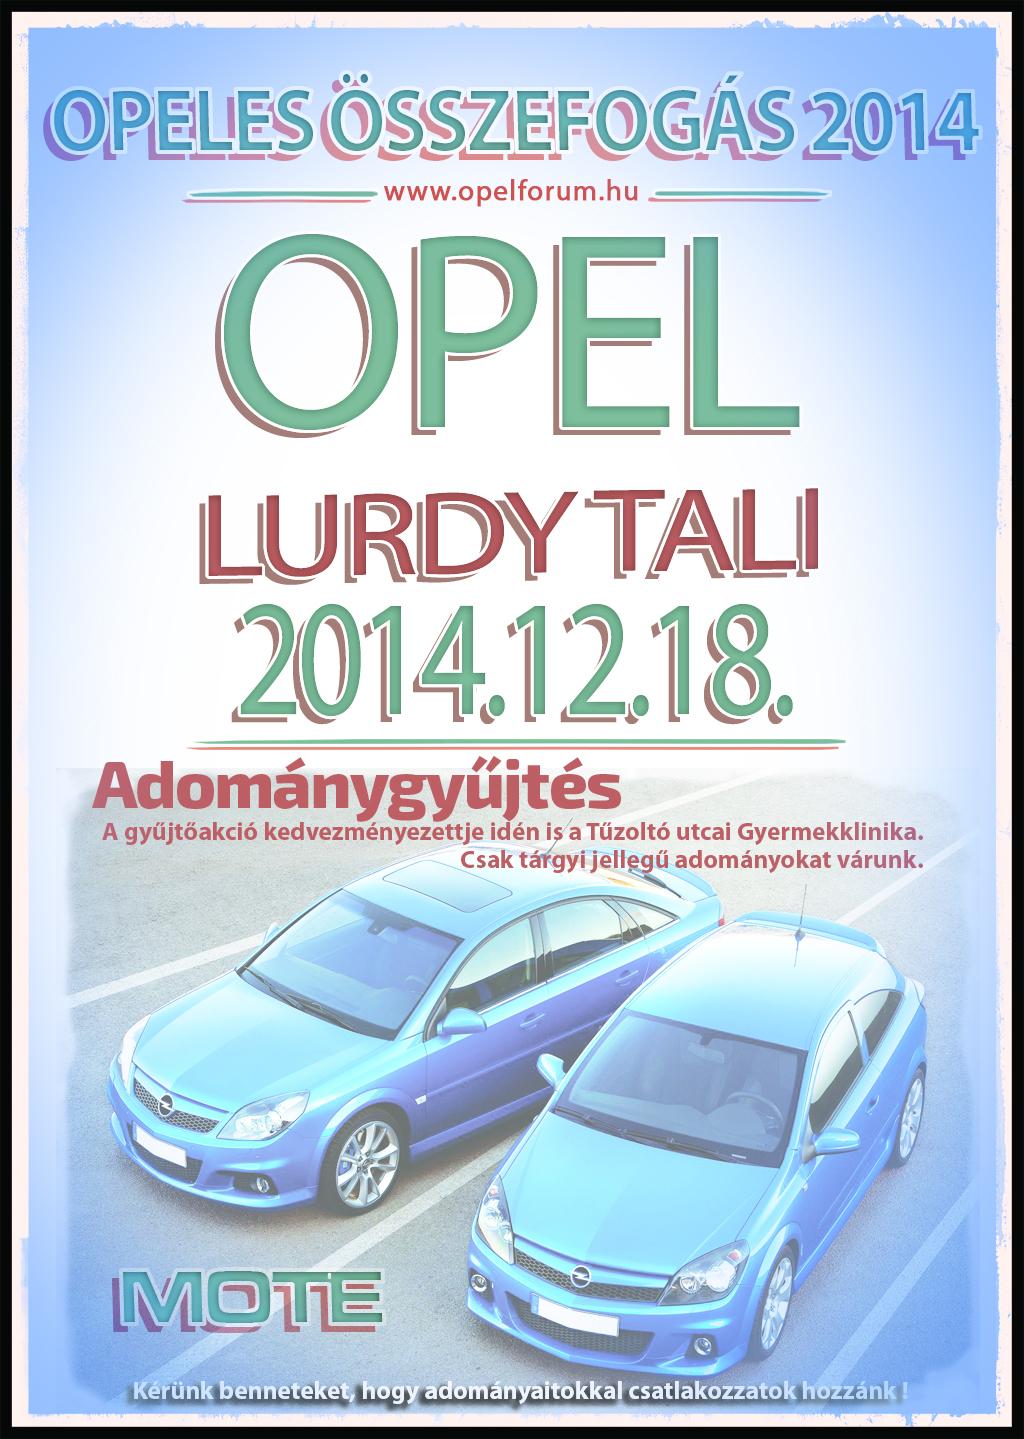 lurdy_adomany_2014_sotetkek.jpg